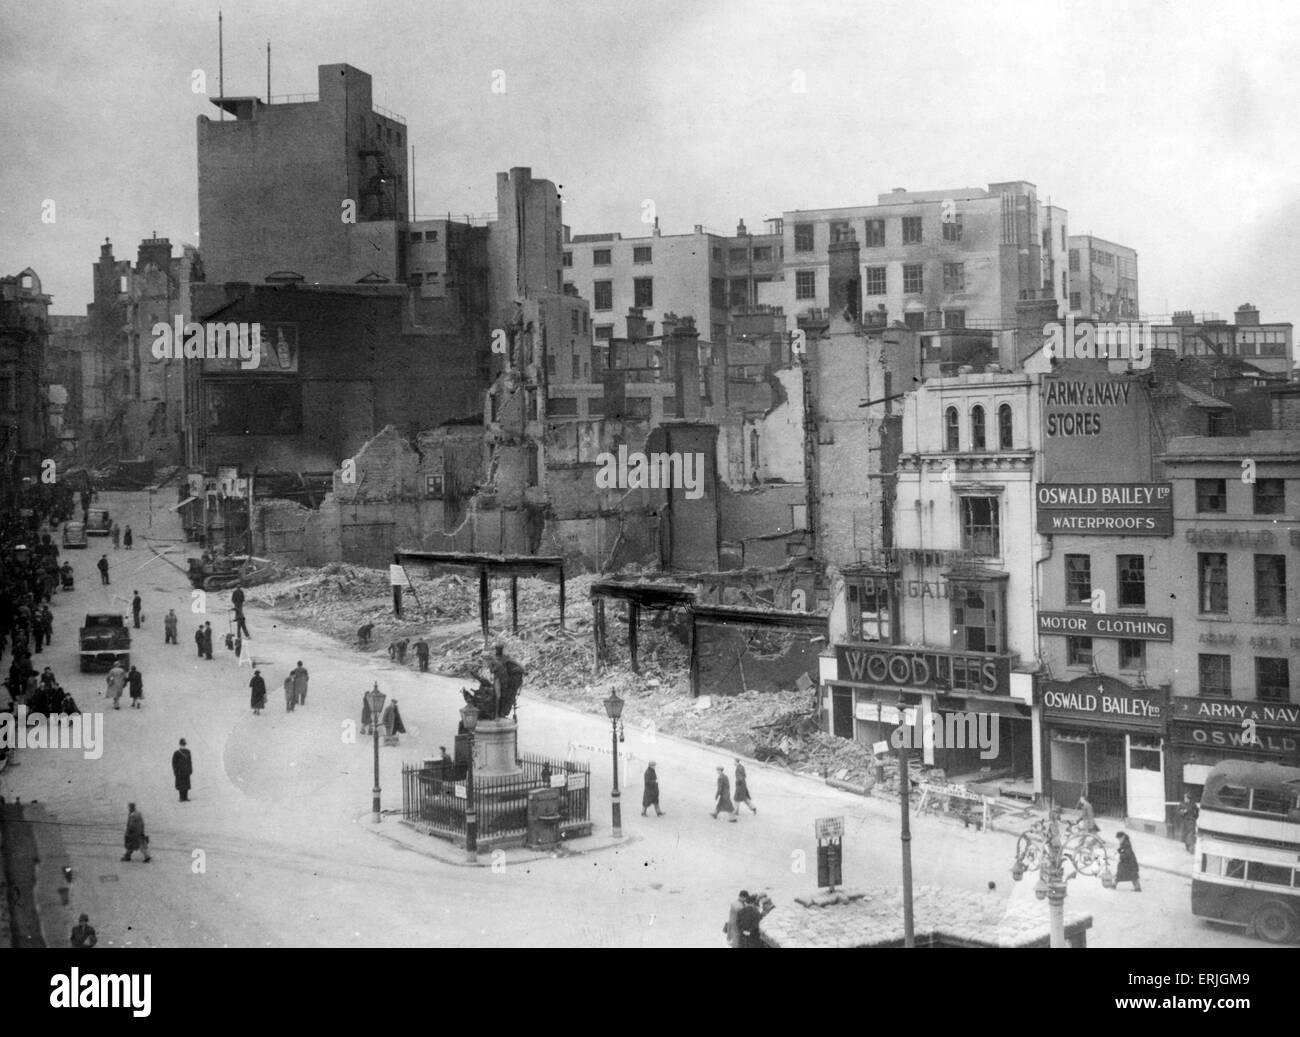 World War Two Air Raids, Birmingham, 10th April 1940. Bull Ring, Birmingham after heavy raid. - Stock Image